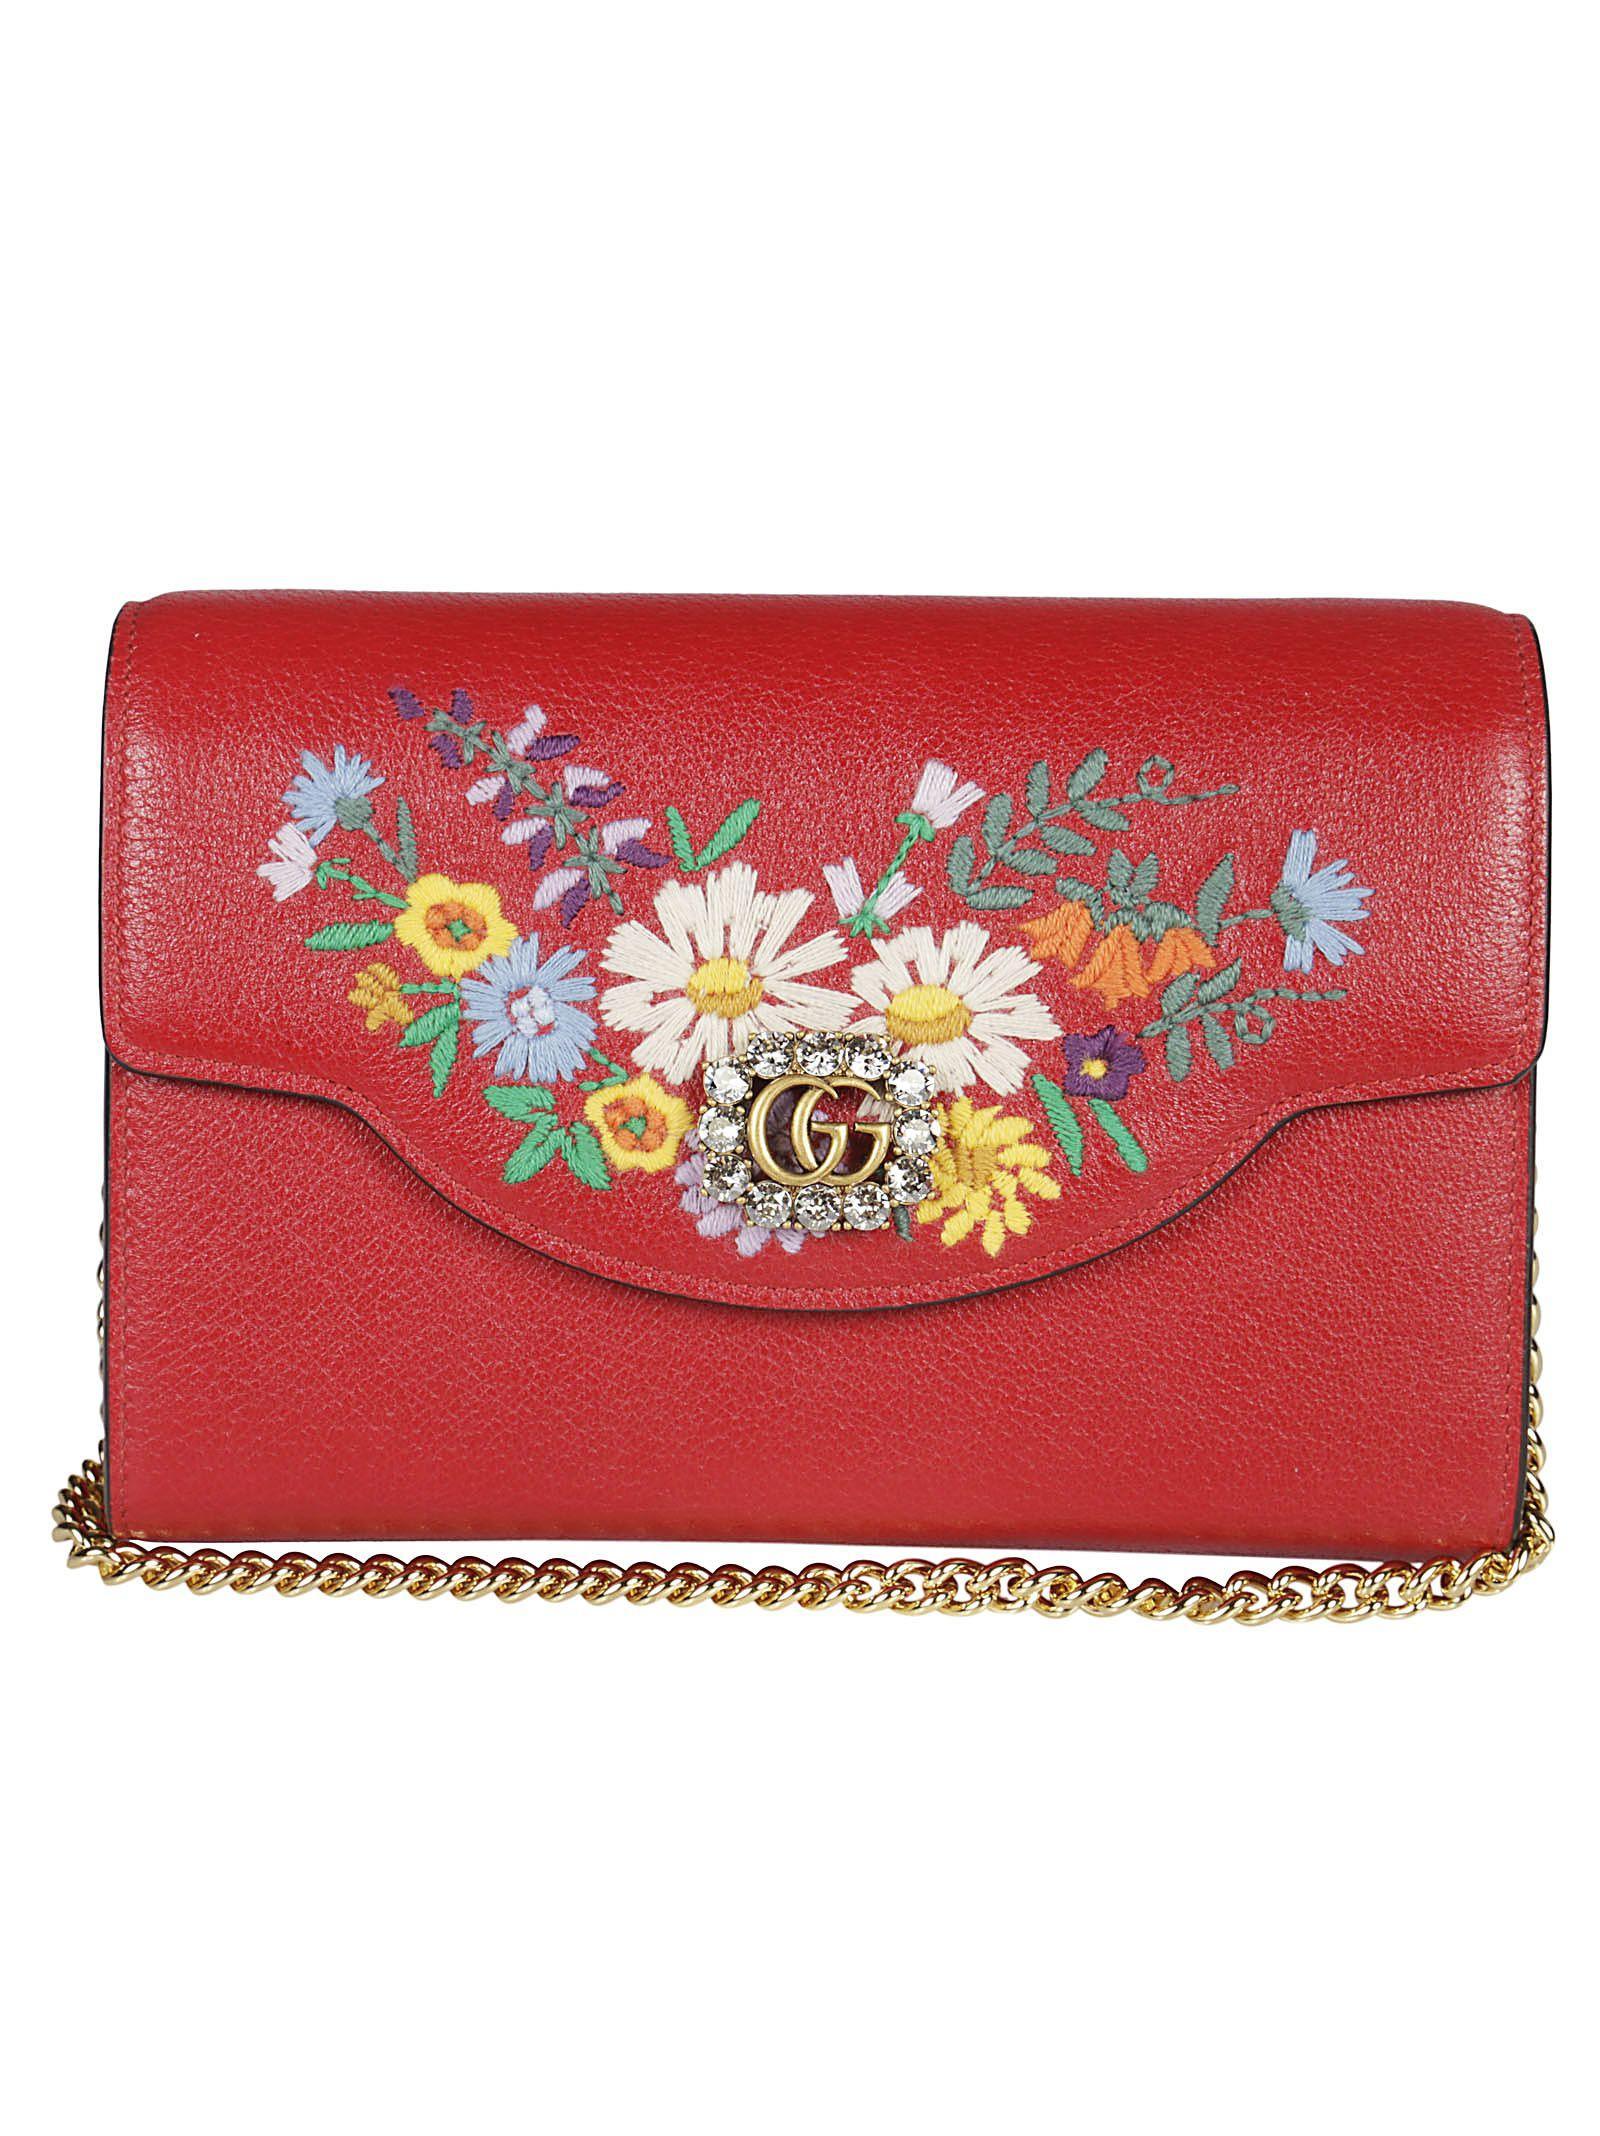 1480bd8d2832 Gucci Embroidered Floral Shoulder Bag In Red   ModeSens